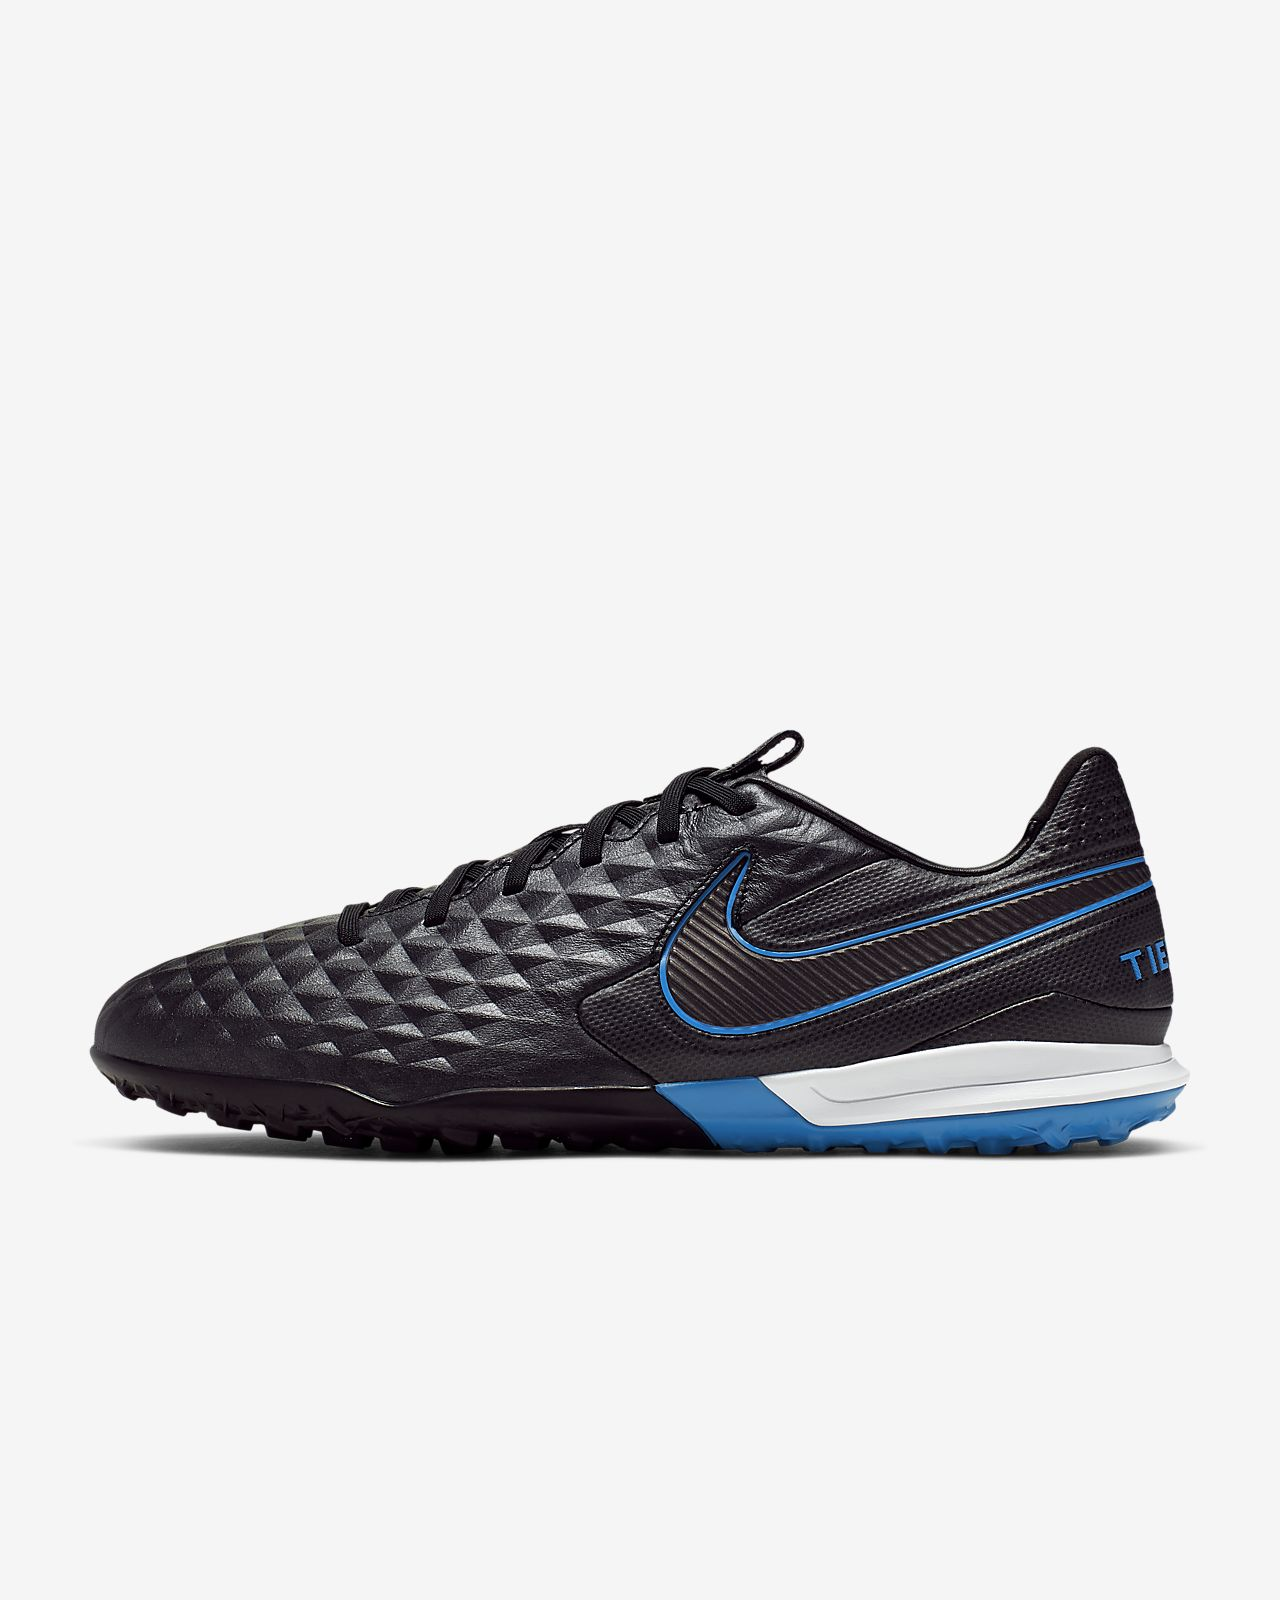 Nike Tiempo Legend 8 Pro TF Artificial Turf Football Shoe